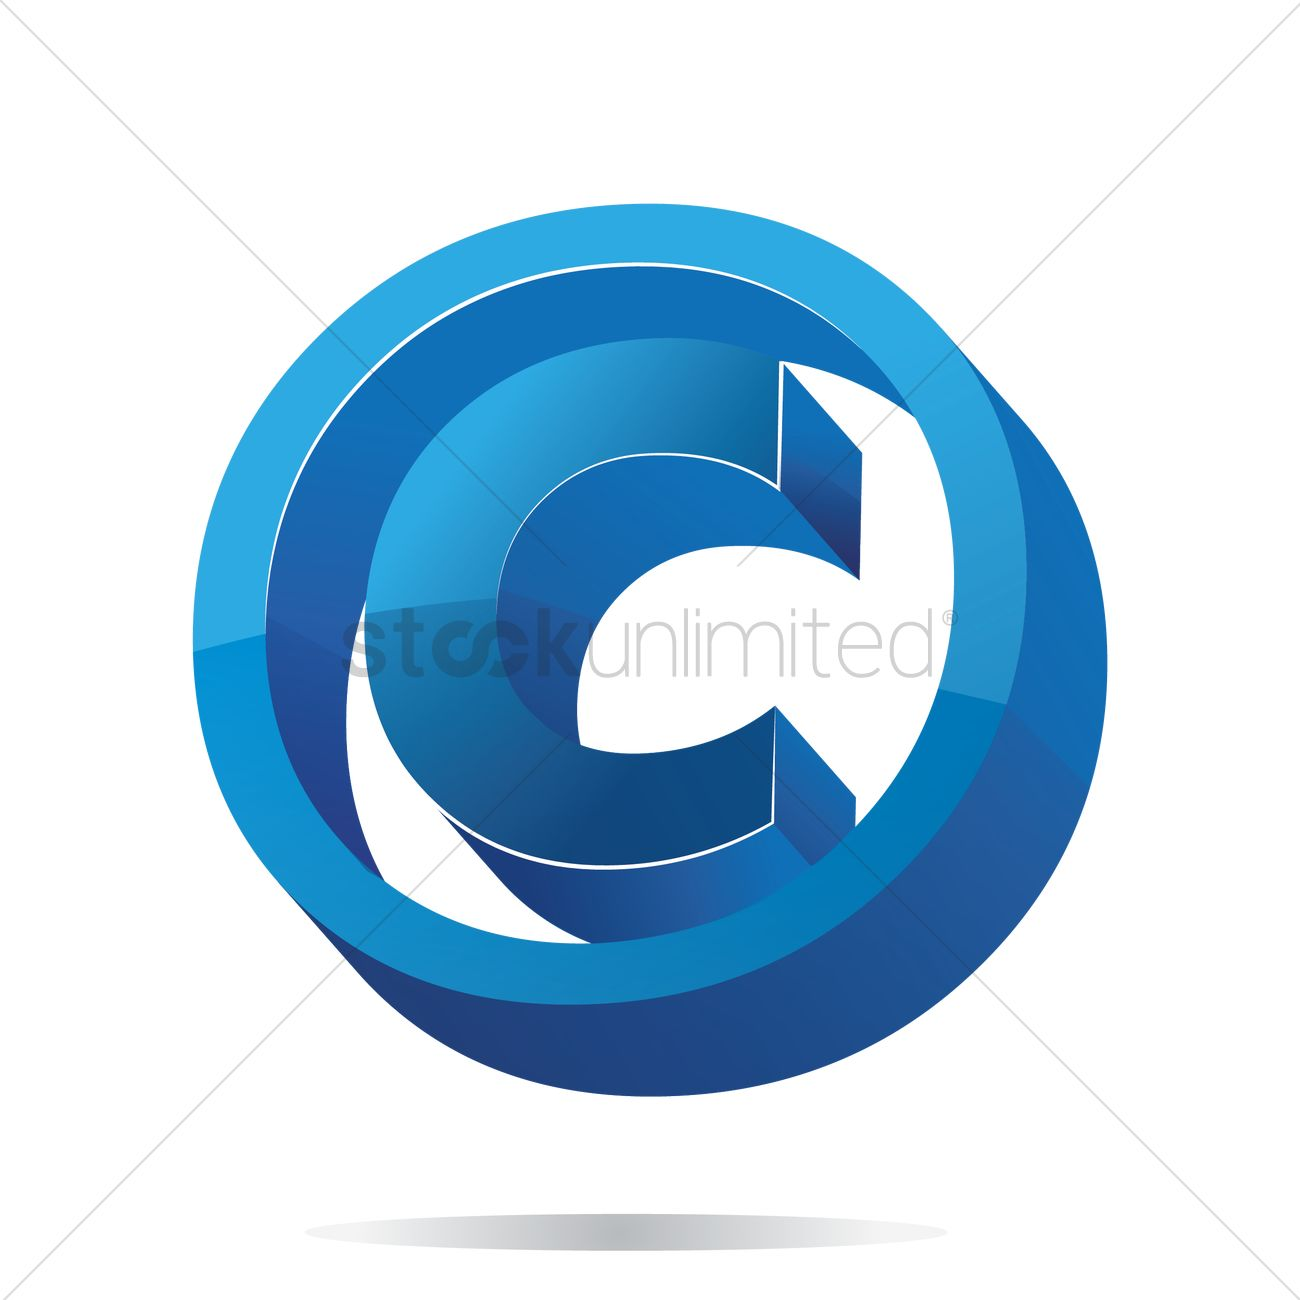 Copyright symbol vector image 1632167 stockunlimited copyright symbol vector graphic biocorpaavc